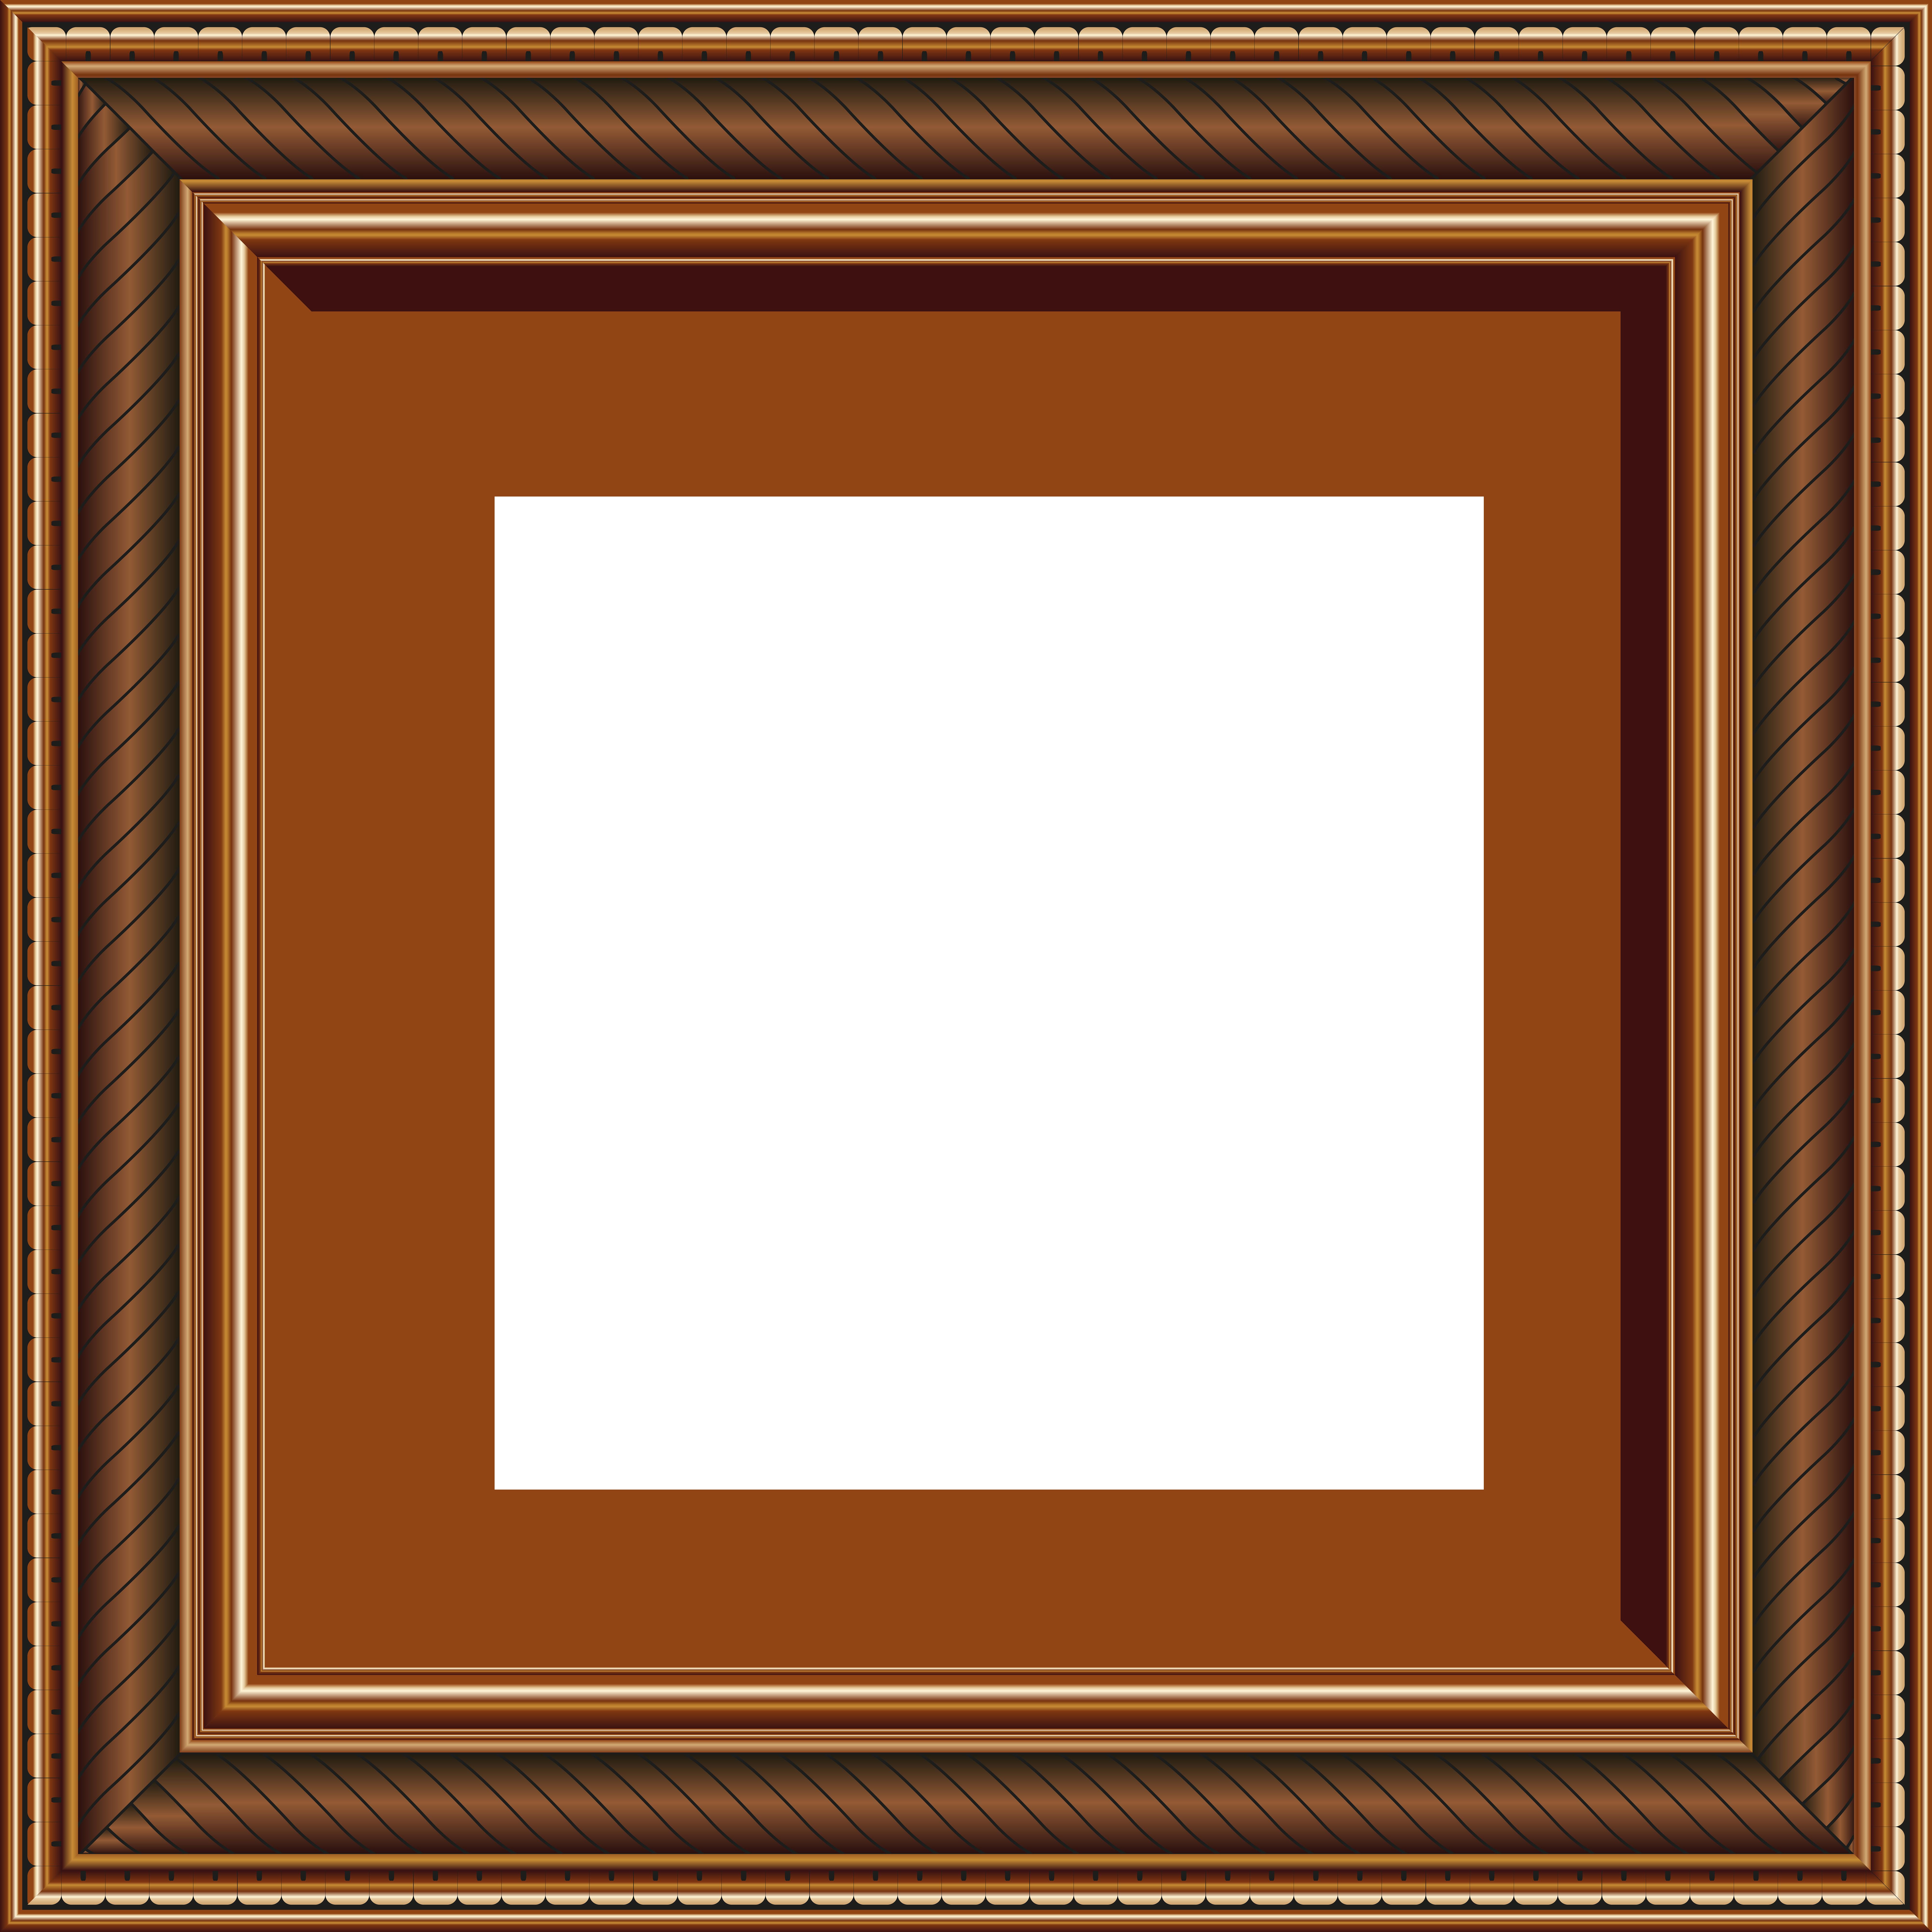 Square clipart photograph border. Transparent brown png photo